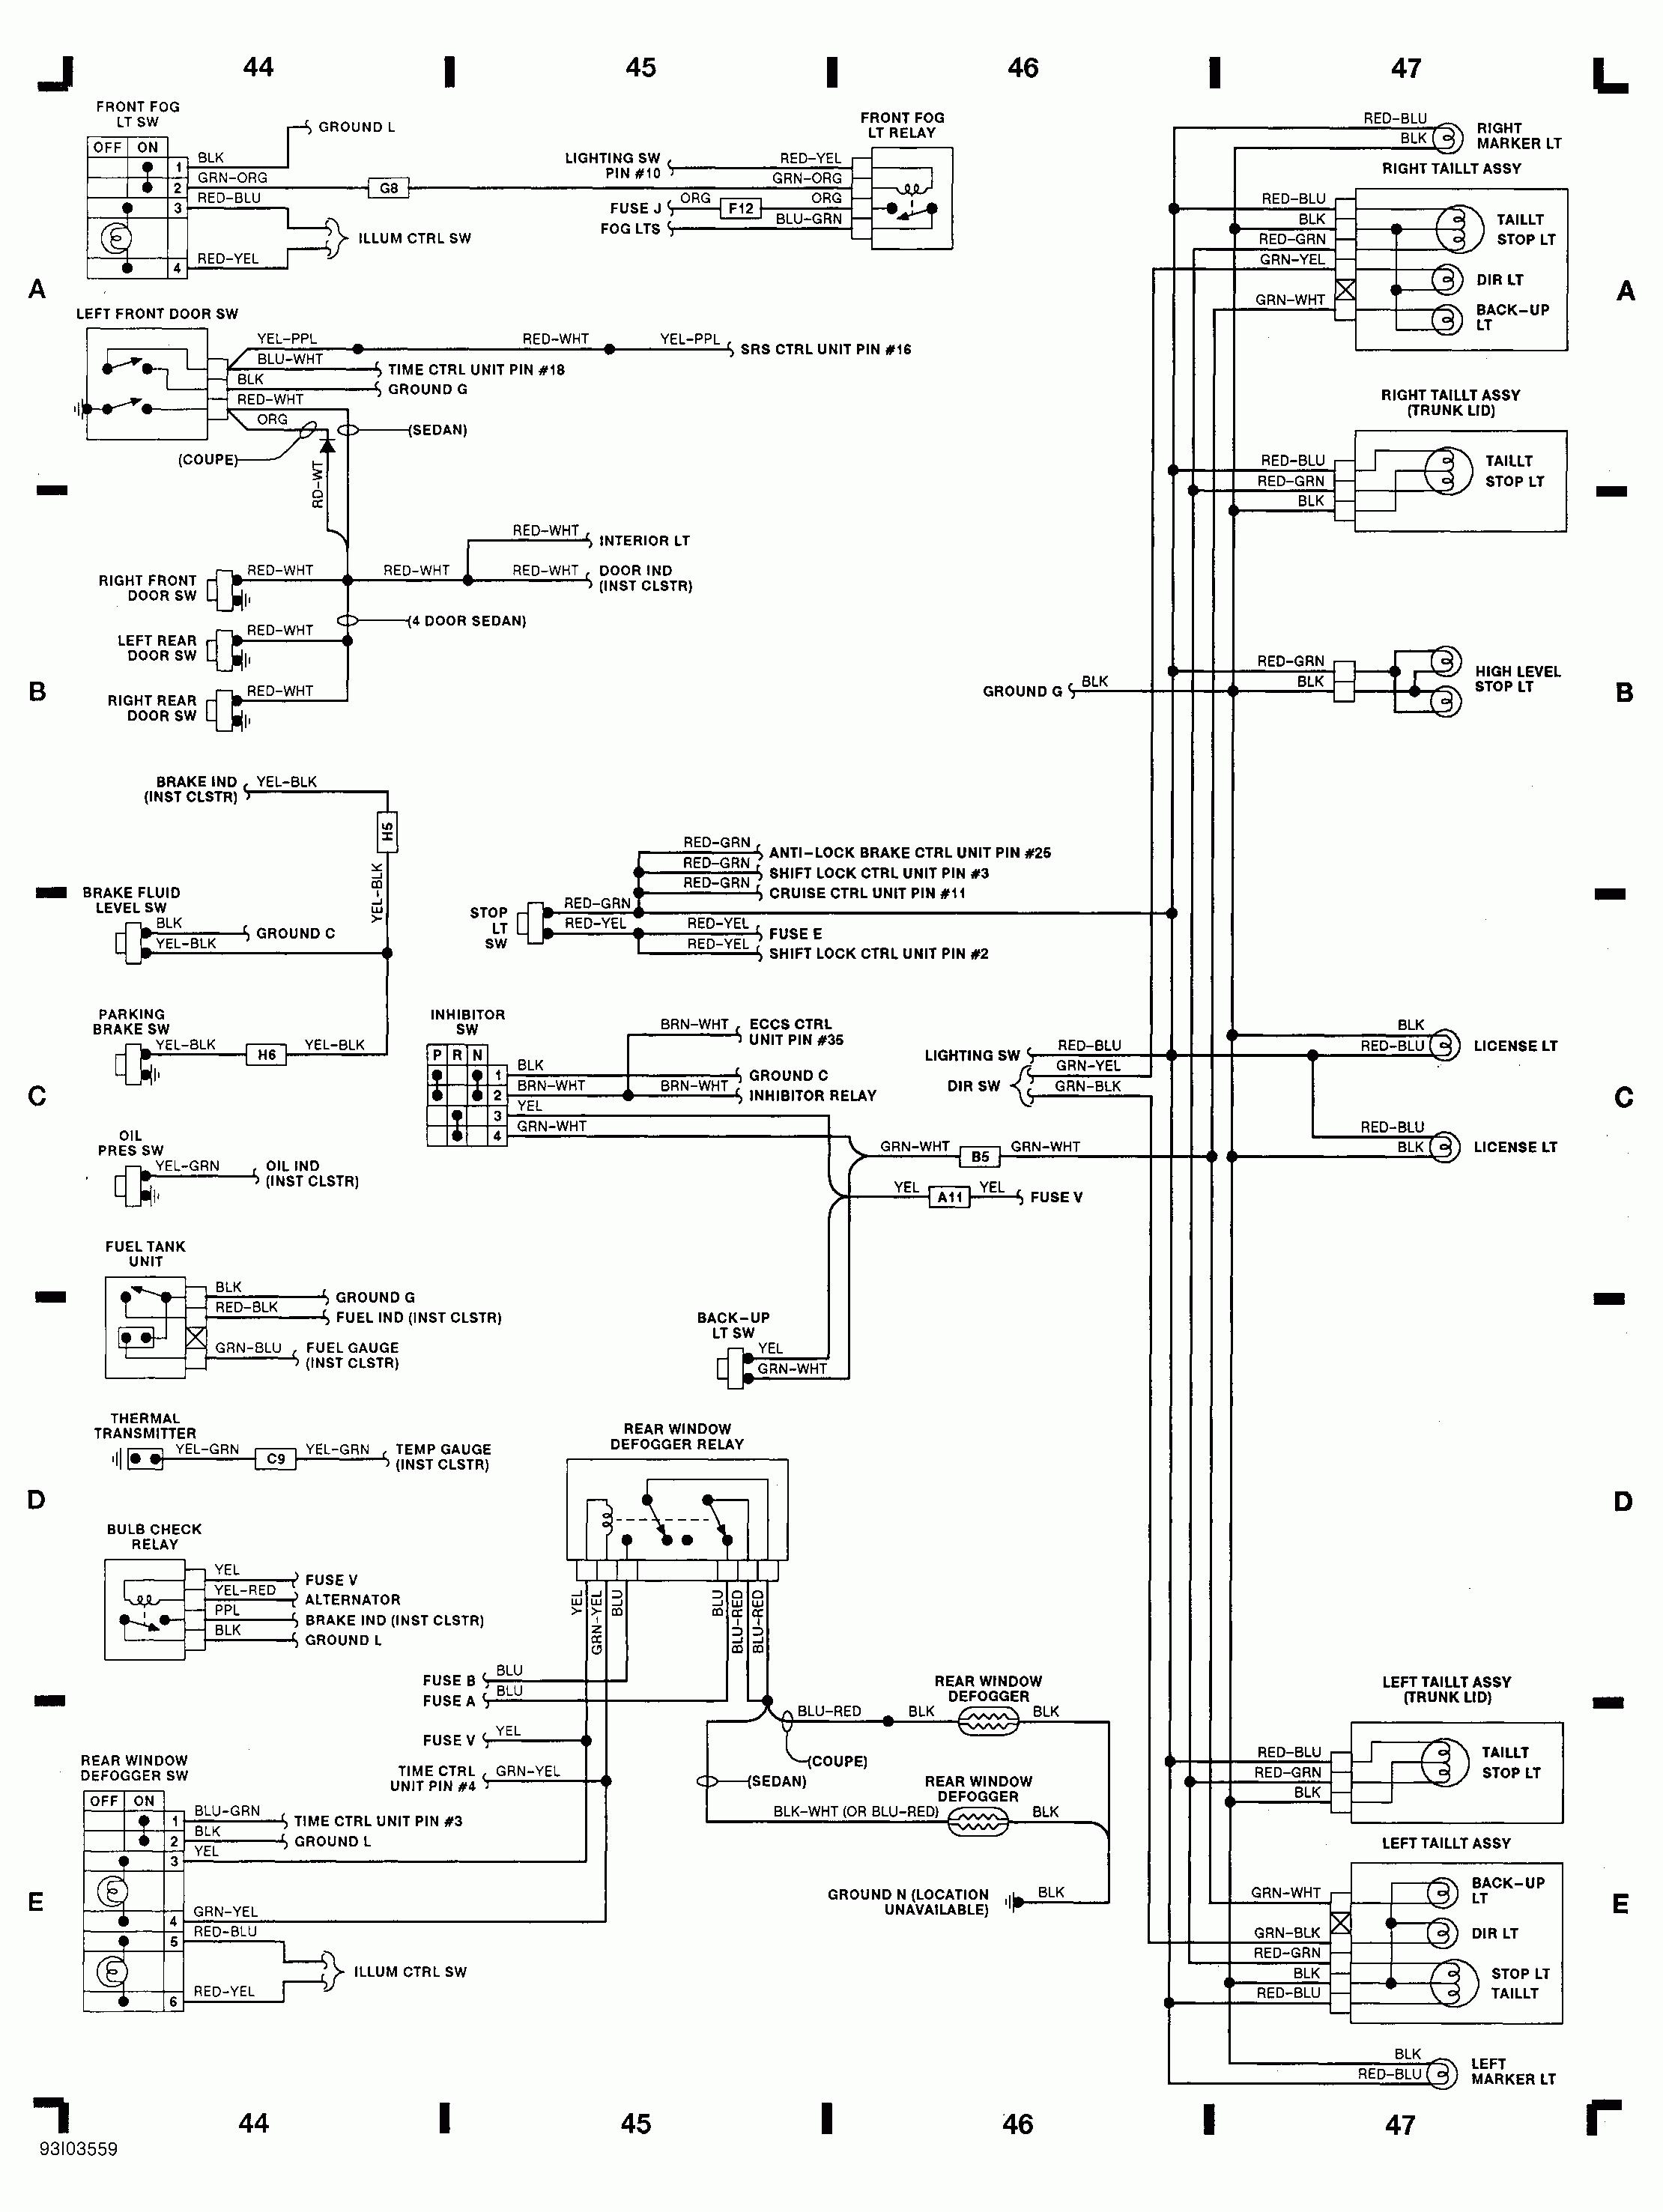 [SCHEMATICS_4ER]  DF_8771] Gmc Sierra Fuse Box Diagram On Wiring Diagram For 2011 Gmc Savana  Free Diagram | 2015 Gmc Savana Wiring Diagram |  | Over Peted Redne Animo Isra Mohammedshrine Librar Wiring 101